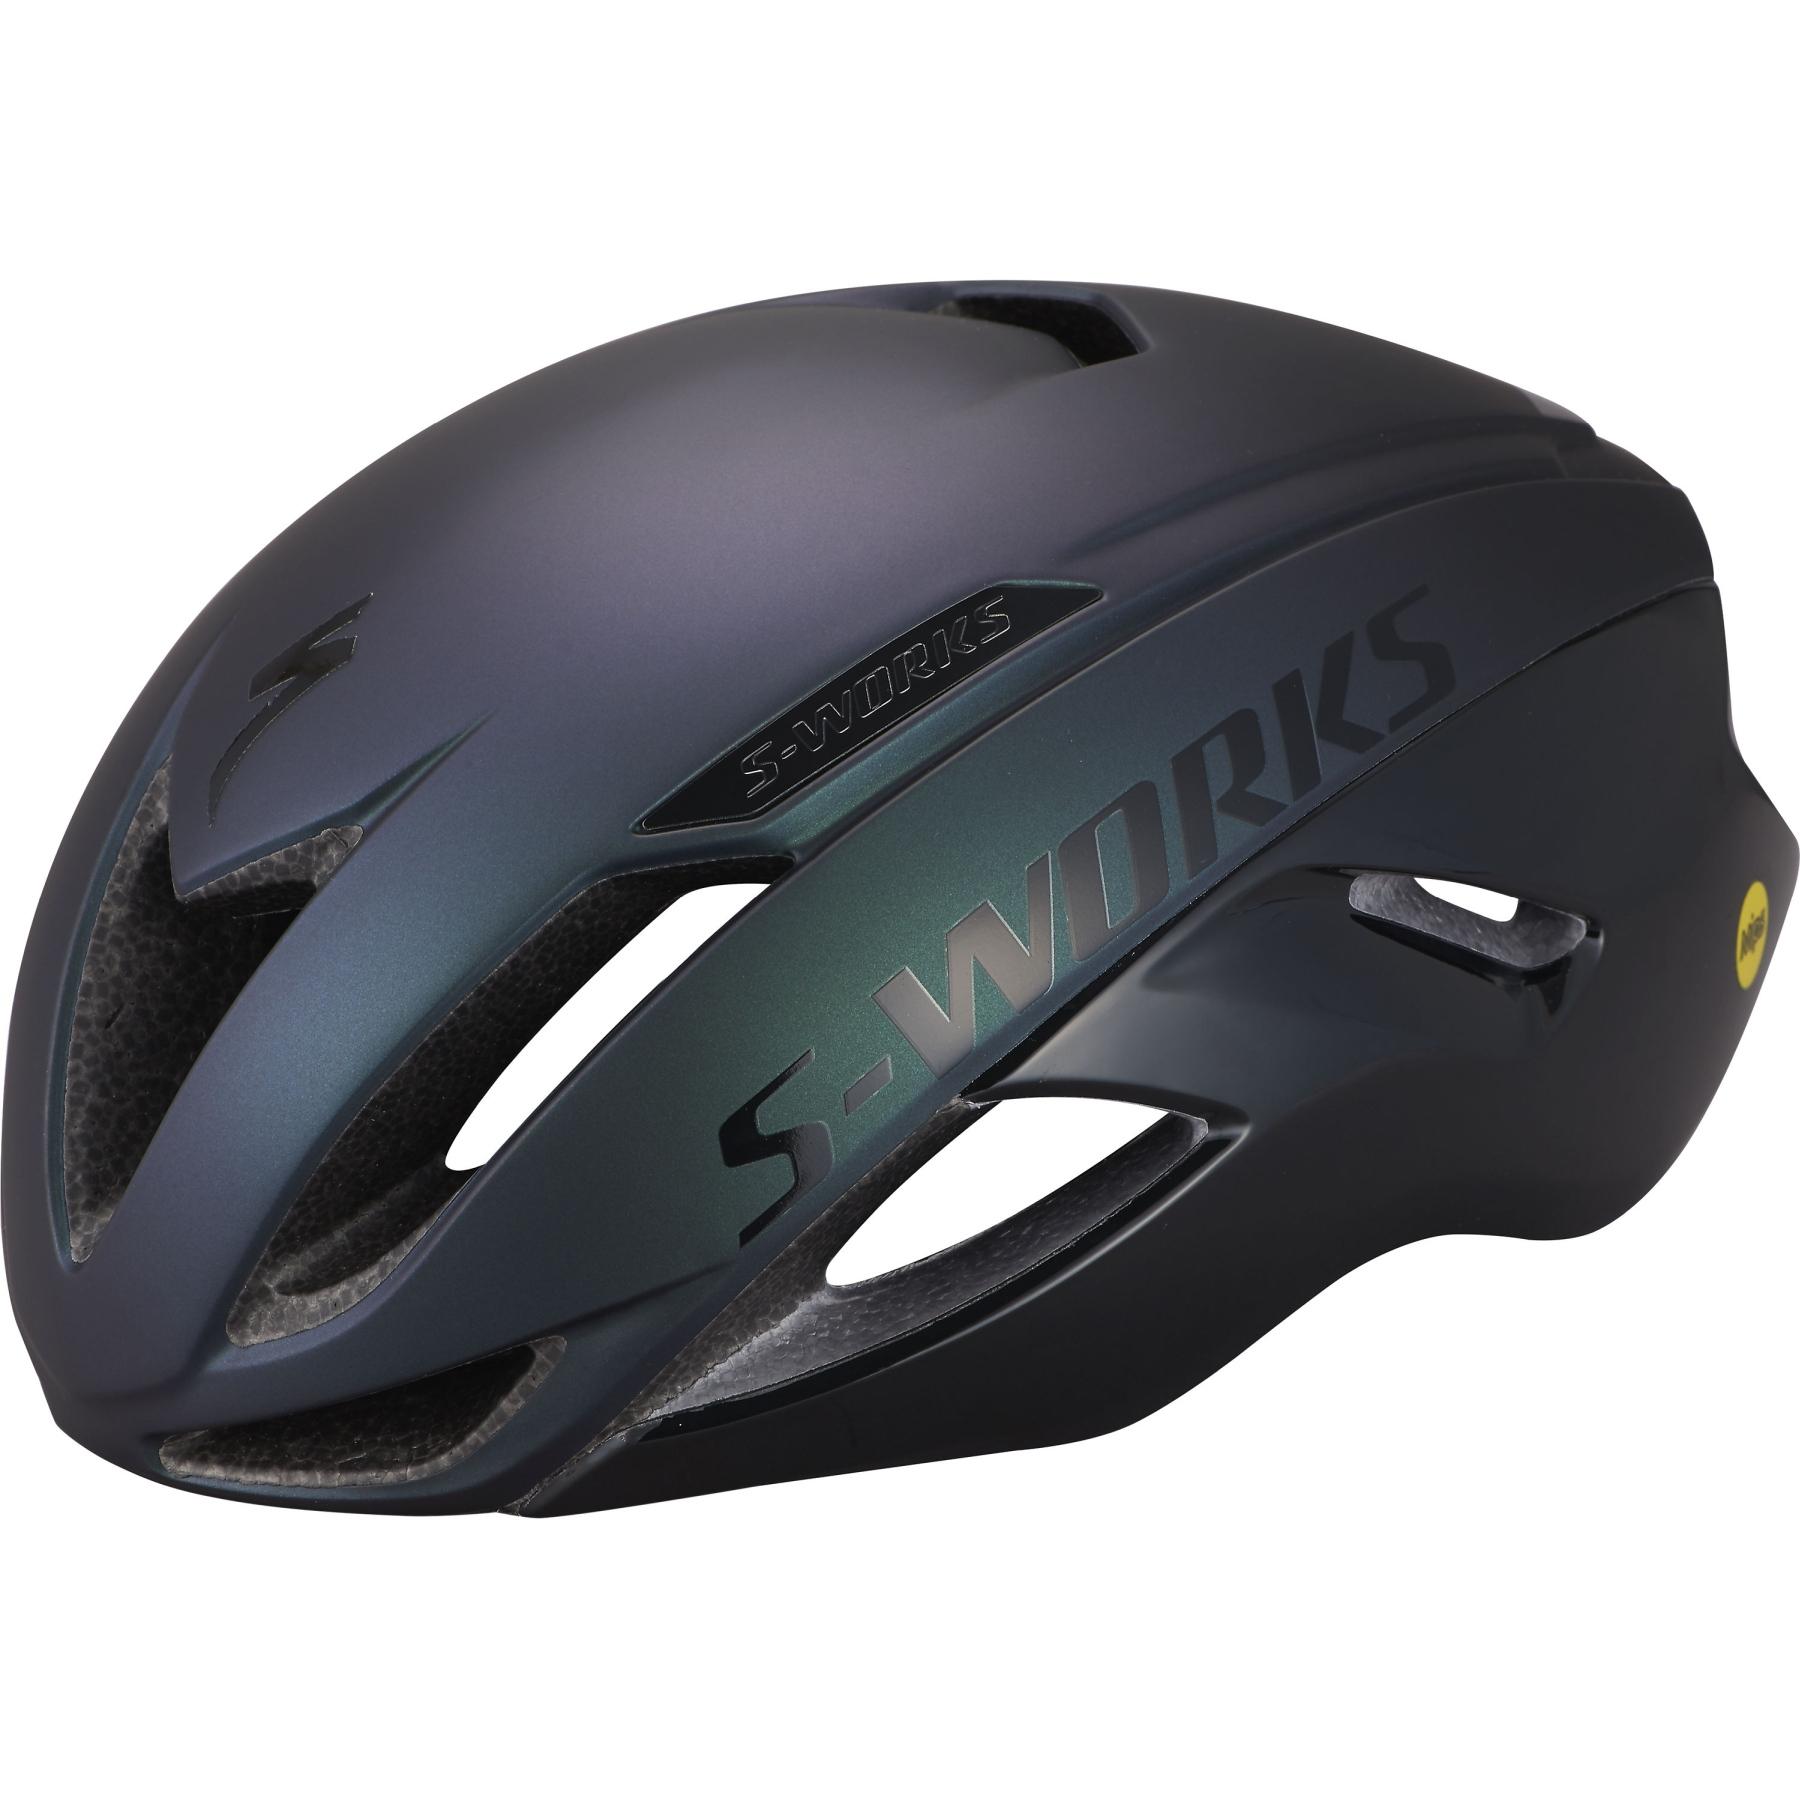 Specialized S-Works Evade II MIPS Helmet - Satin Chameleon/Gloss Black